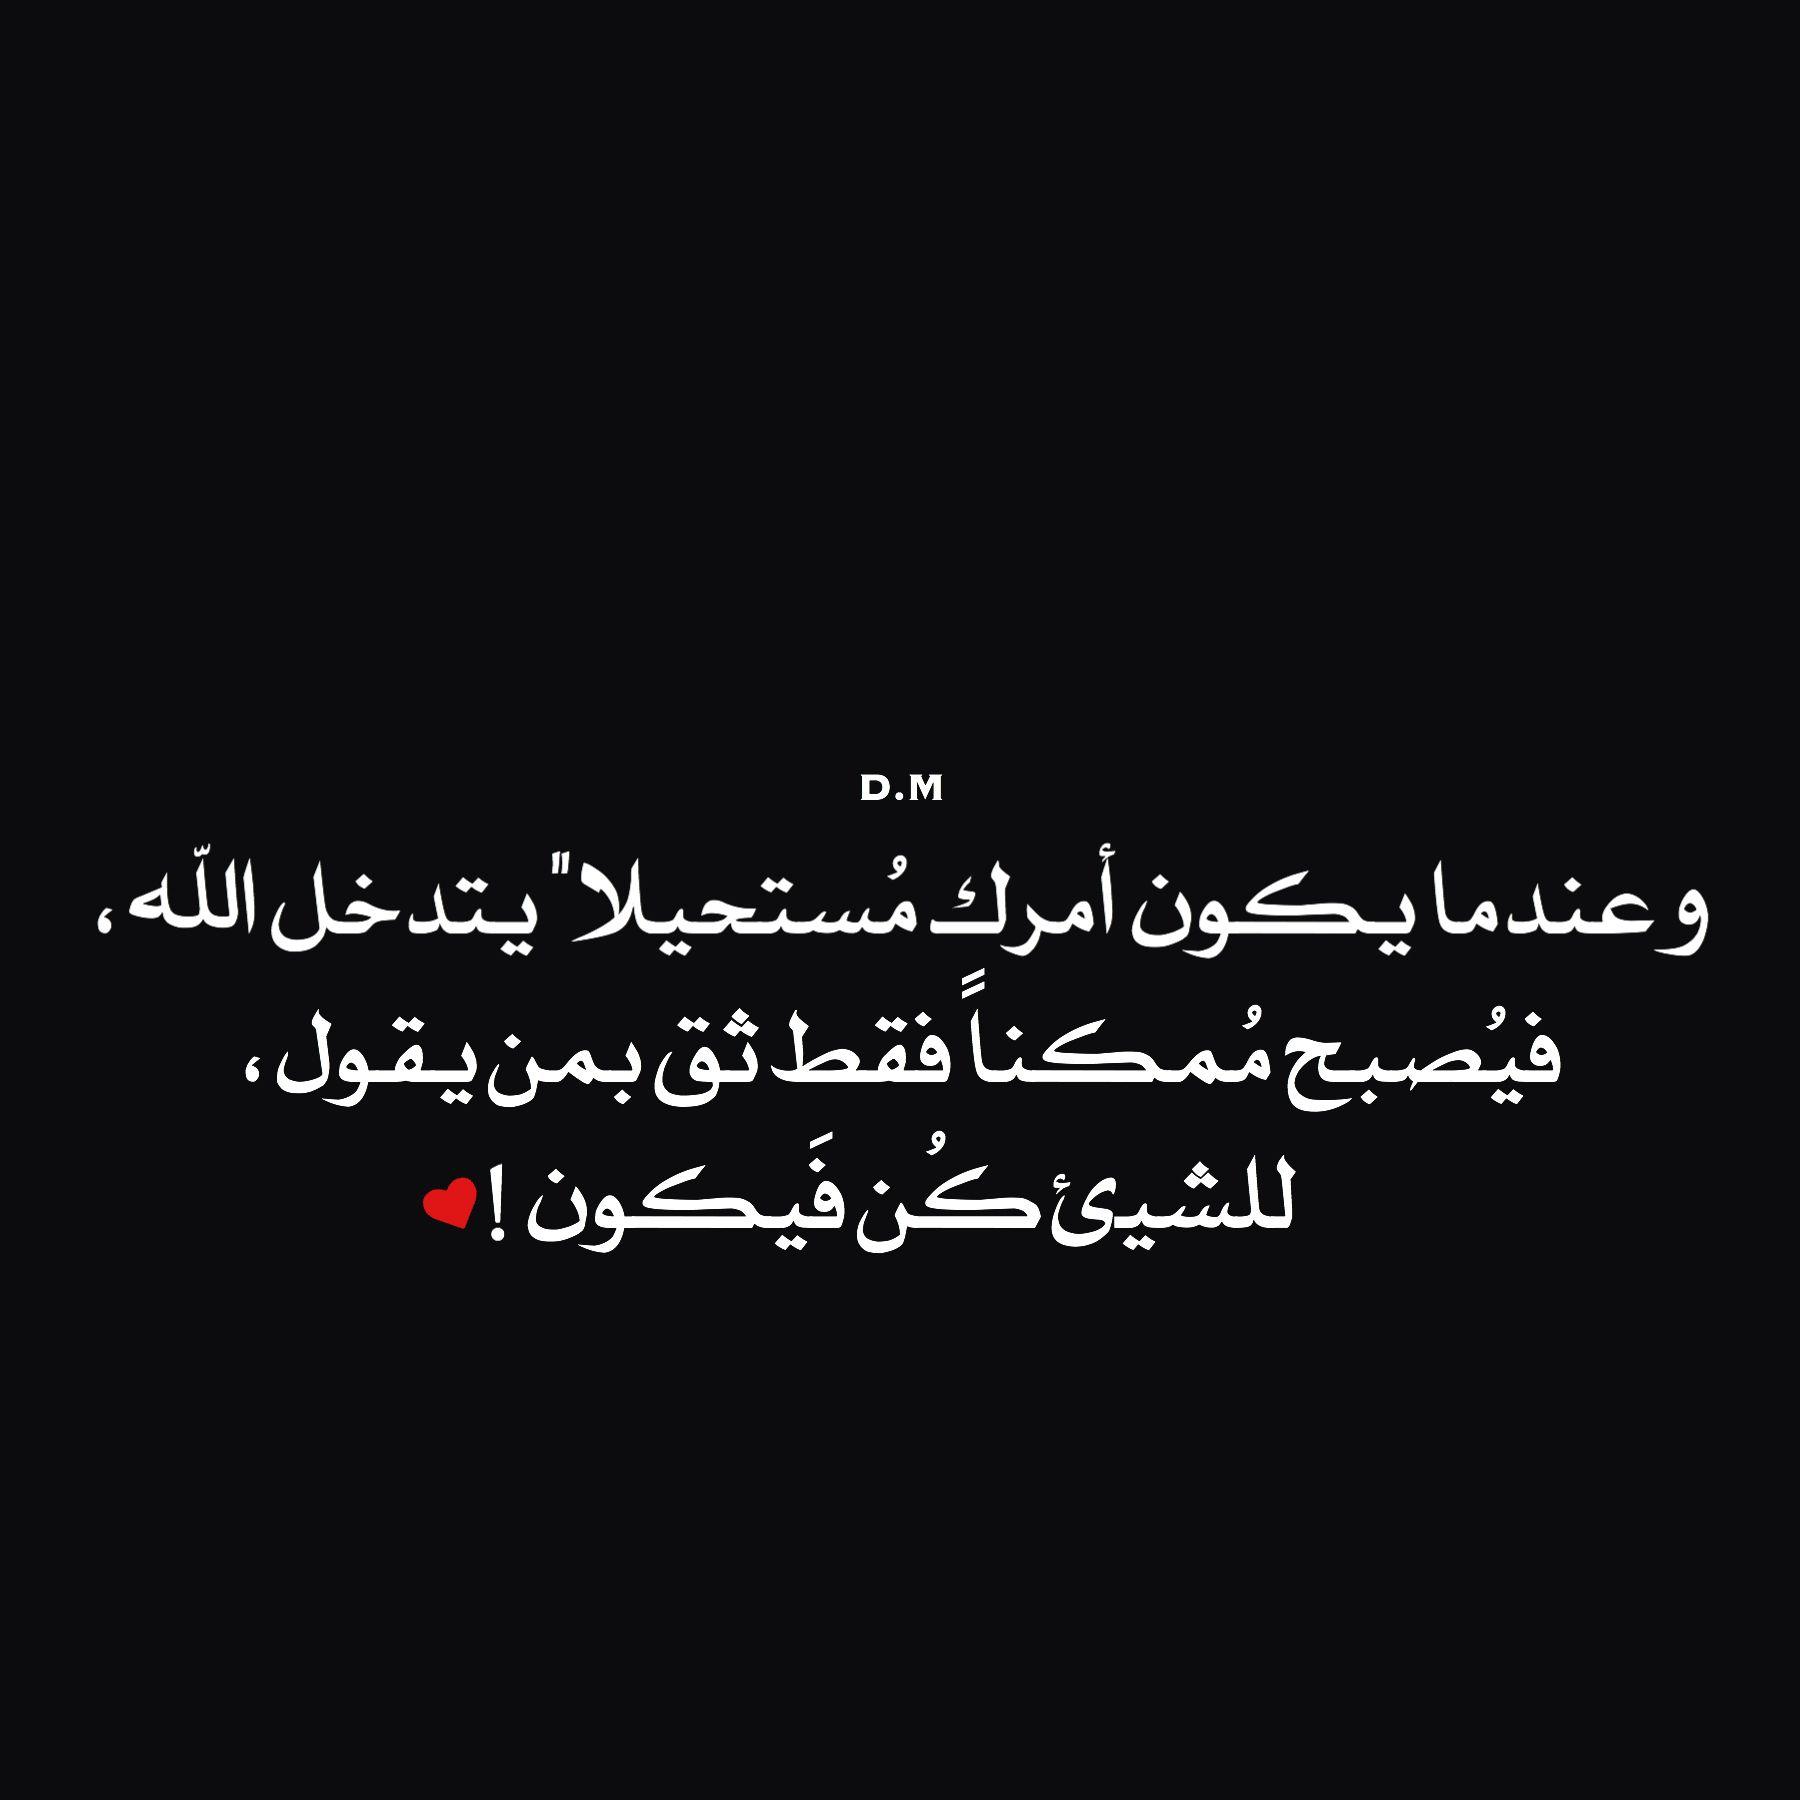 حچي عراقي حچي عراقي حجي عراقي إقتباسات اقتباسات فصيح حب غزل عشق شتاء D M Dm Dmk Mk Alls Dmsharq Islamic Love Quotes Love Quotes Beautiful Mind